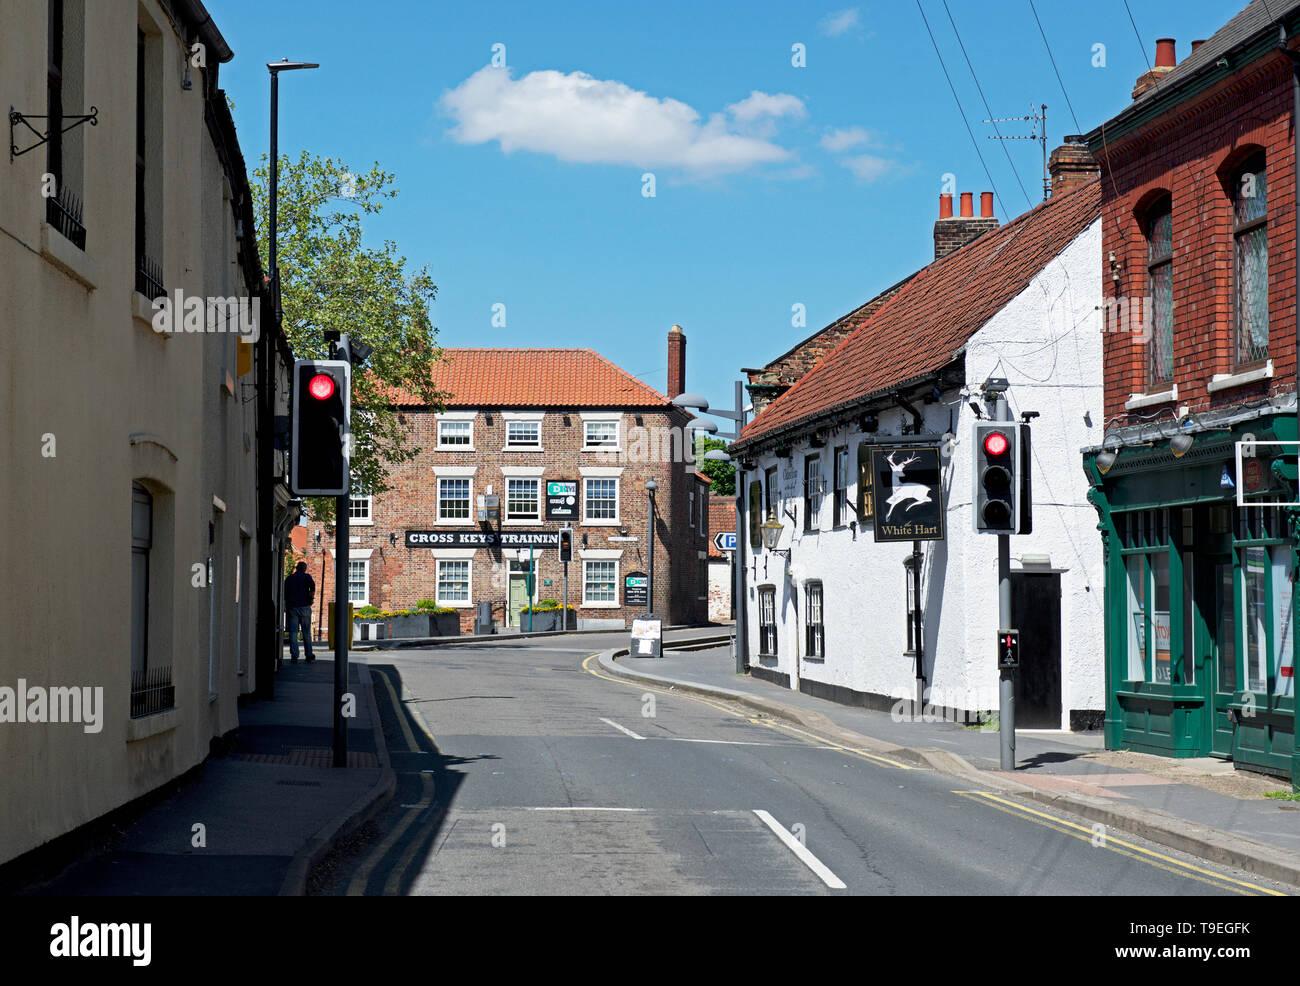 Main Street, Crowle, North Lincolnshire, England UK - Stock Image